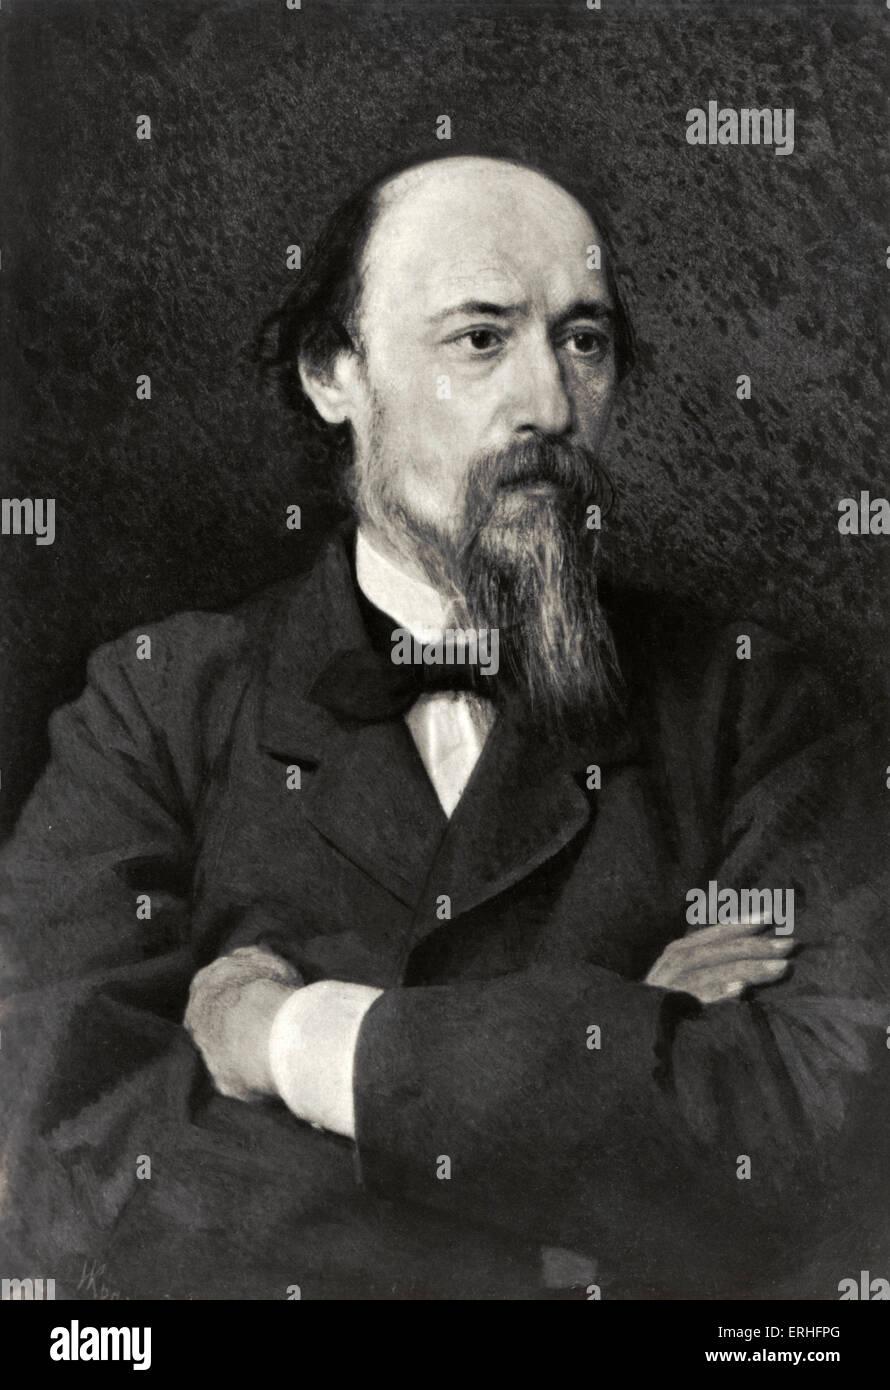 Nikolai Alekseyevich Nekrasov - portrait of the Russian poet. 28 November 1821 - 8 January 1878. - Stock Image